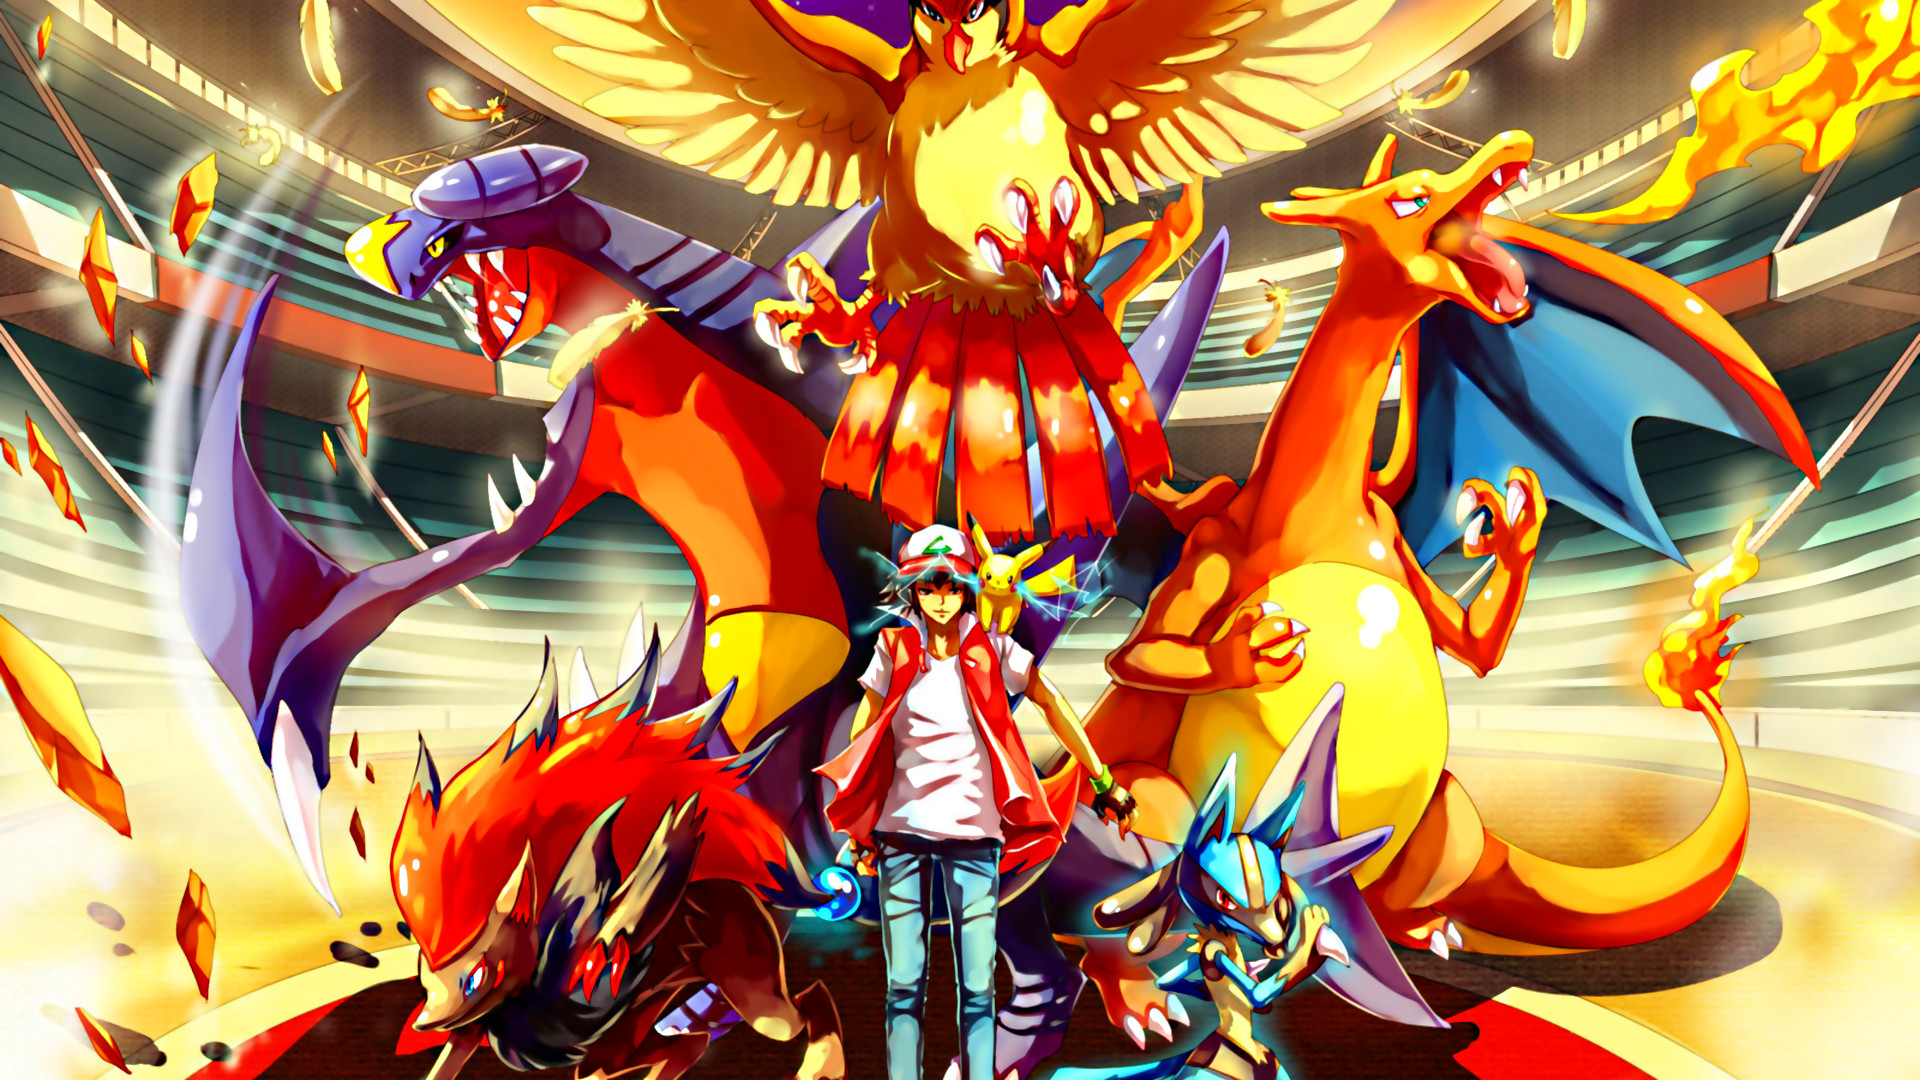 Tornando, ergo, all'argomento iniziale, ovvero i Pokémon, possiam .